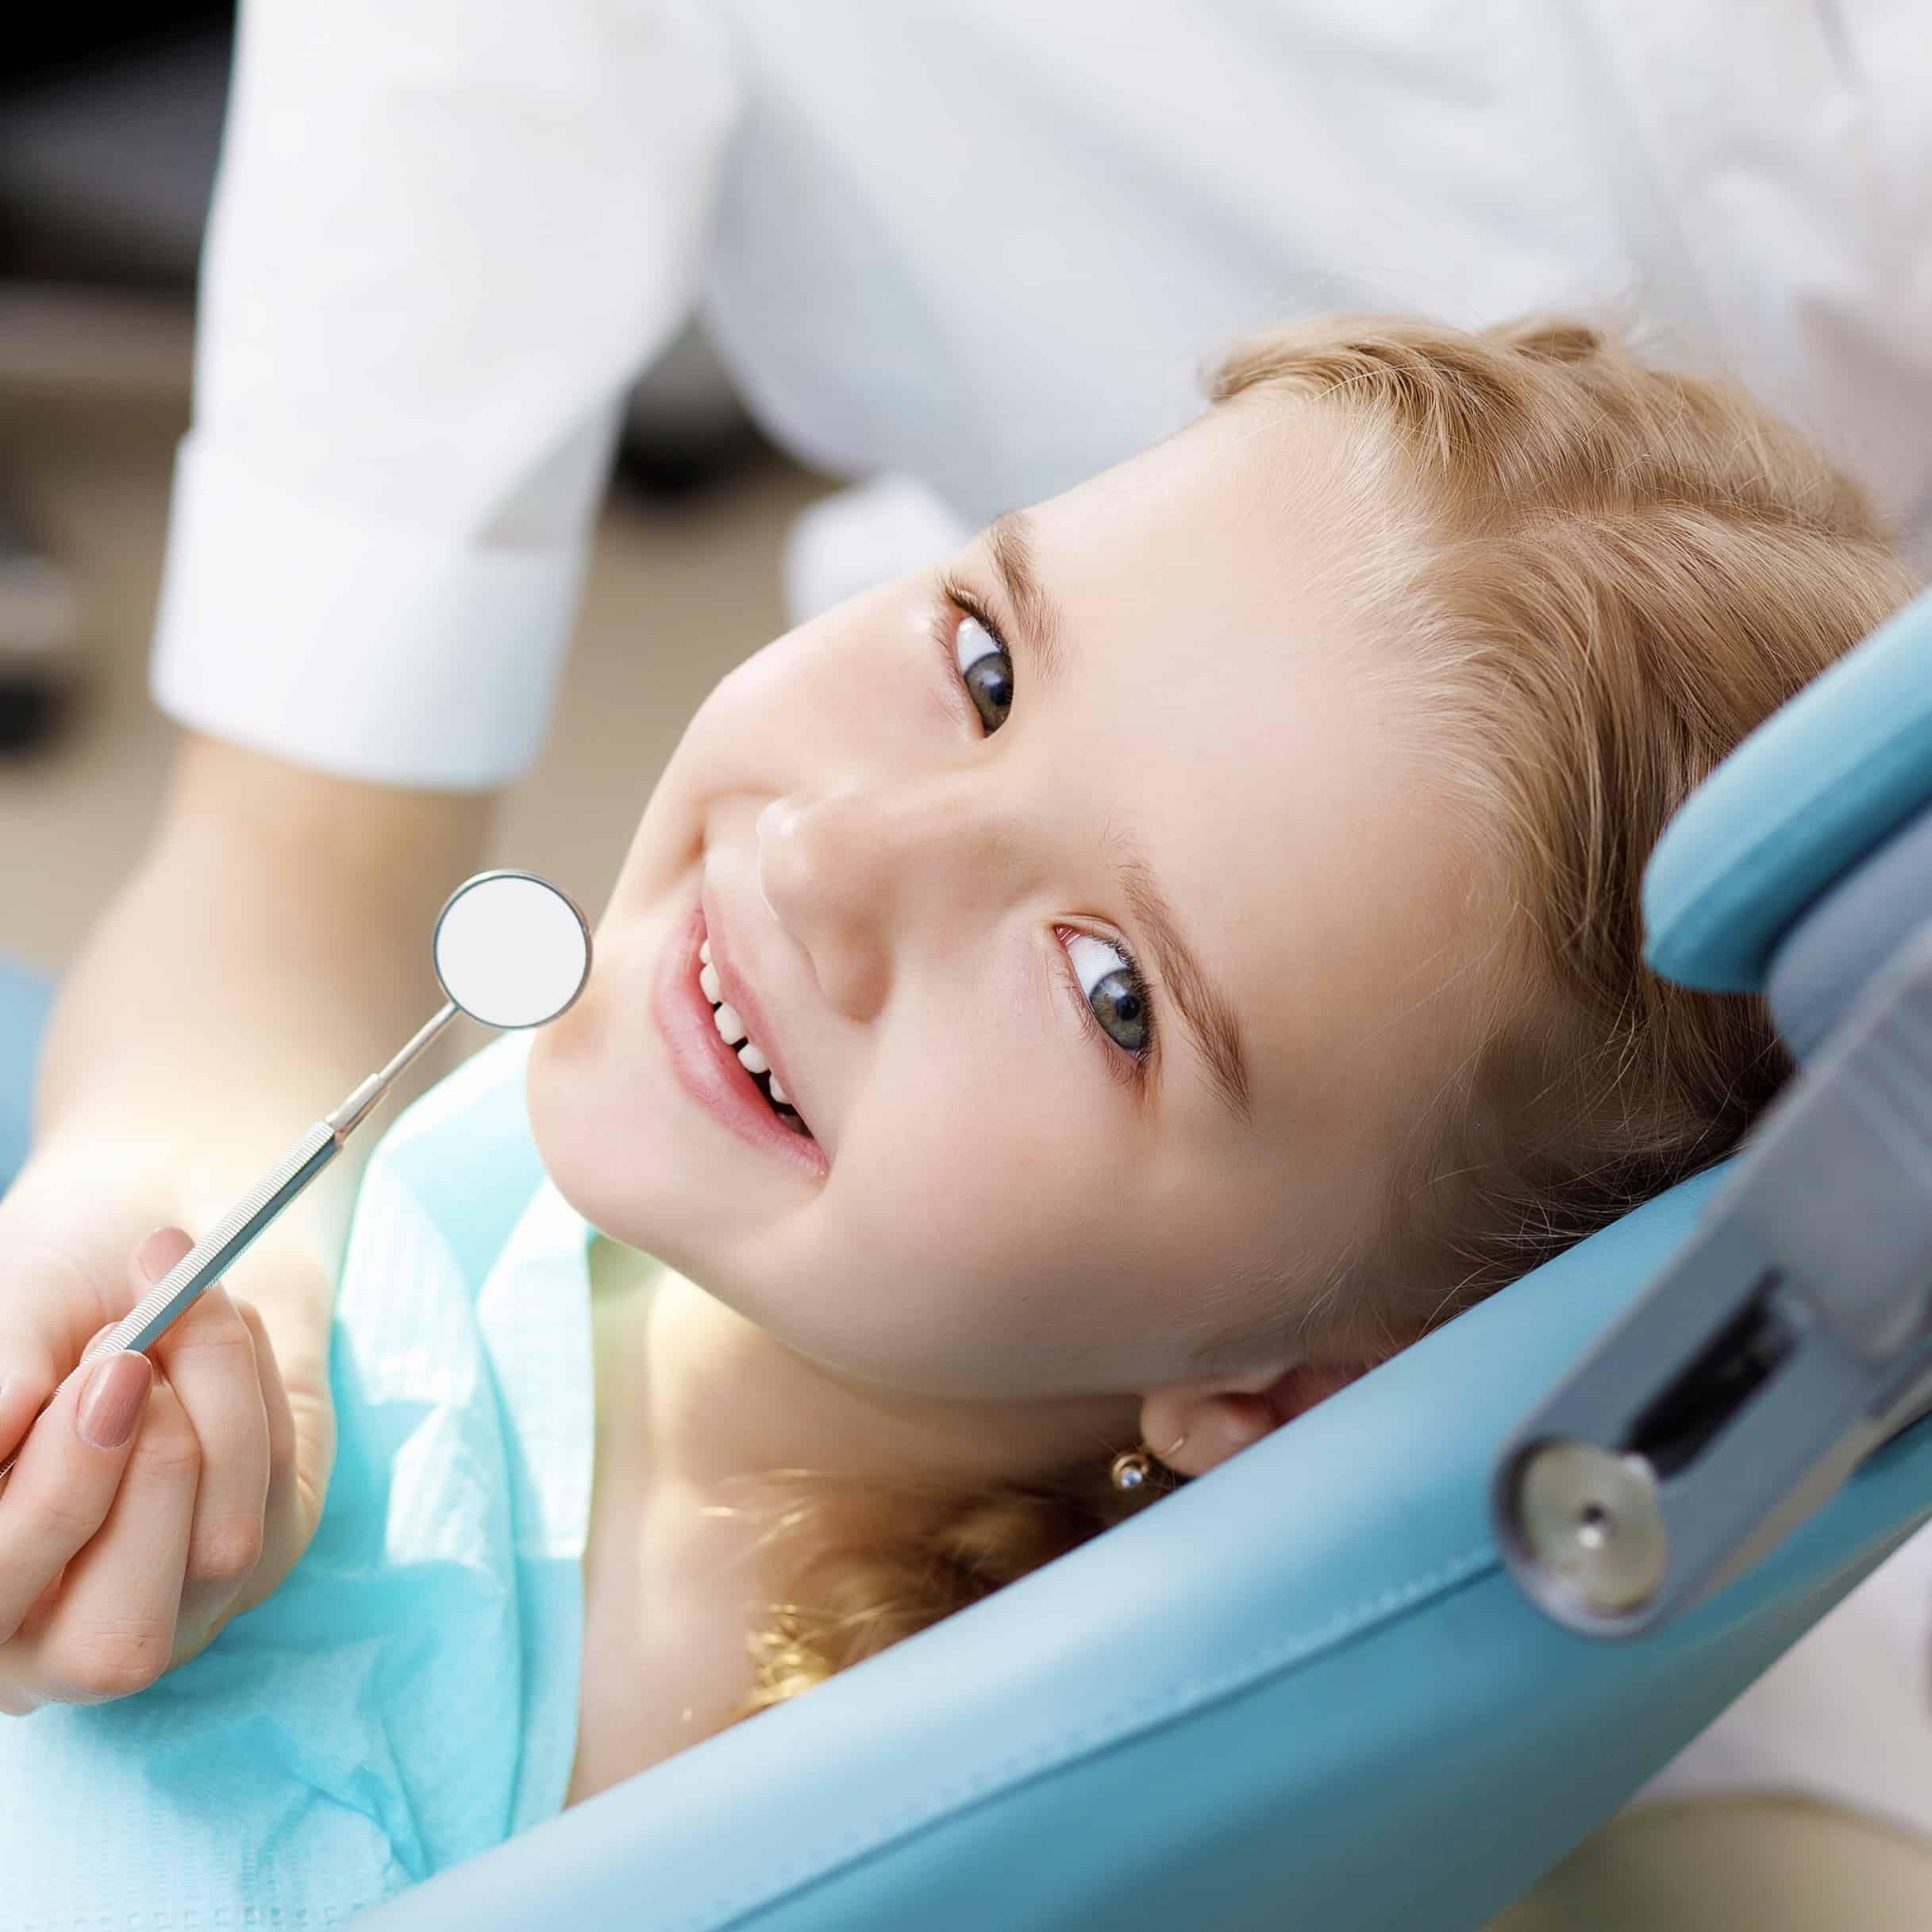 wilmingtn nc dental services